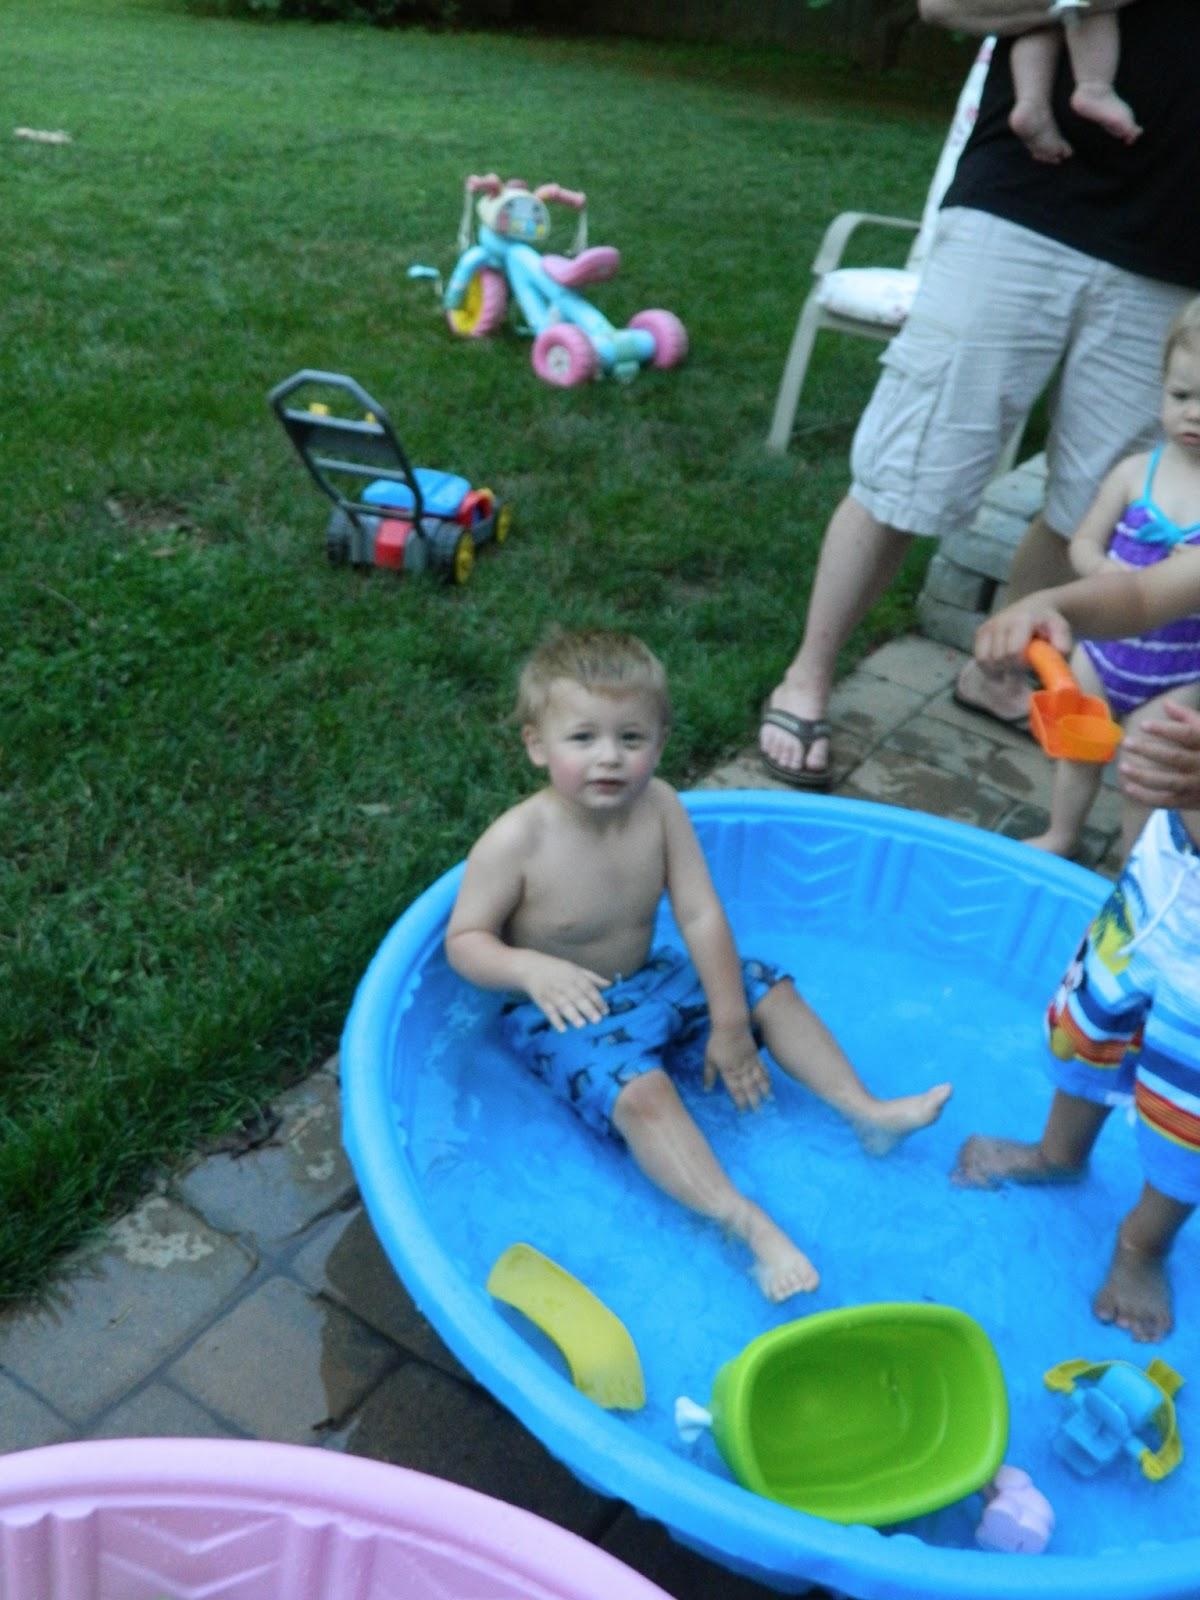 Nudist children